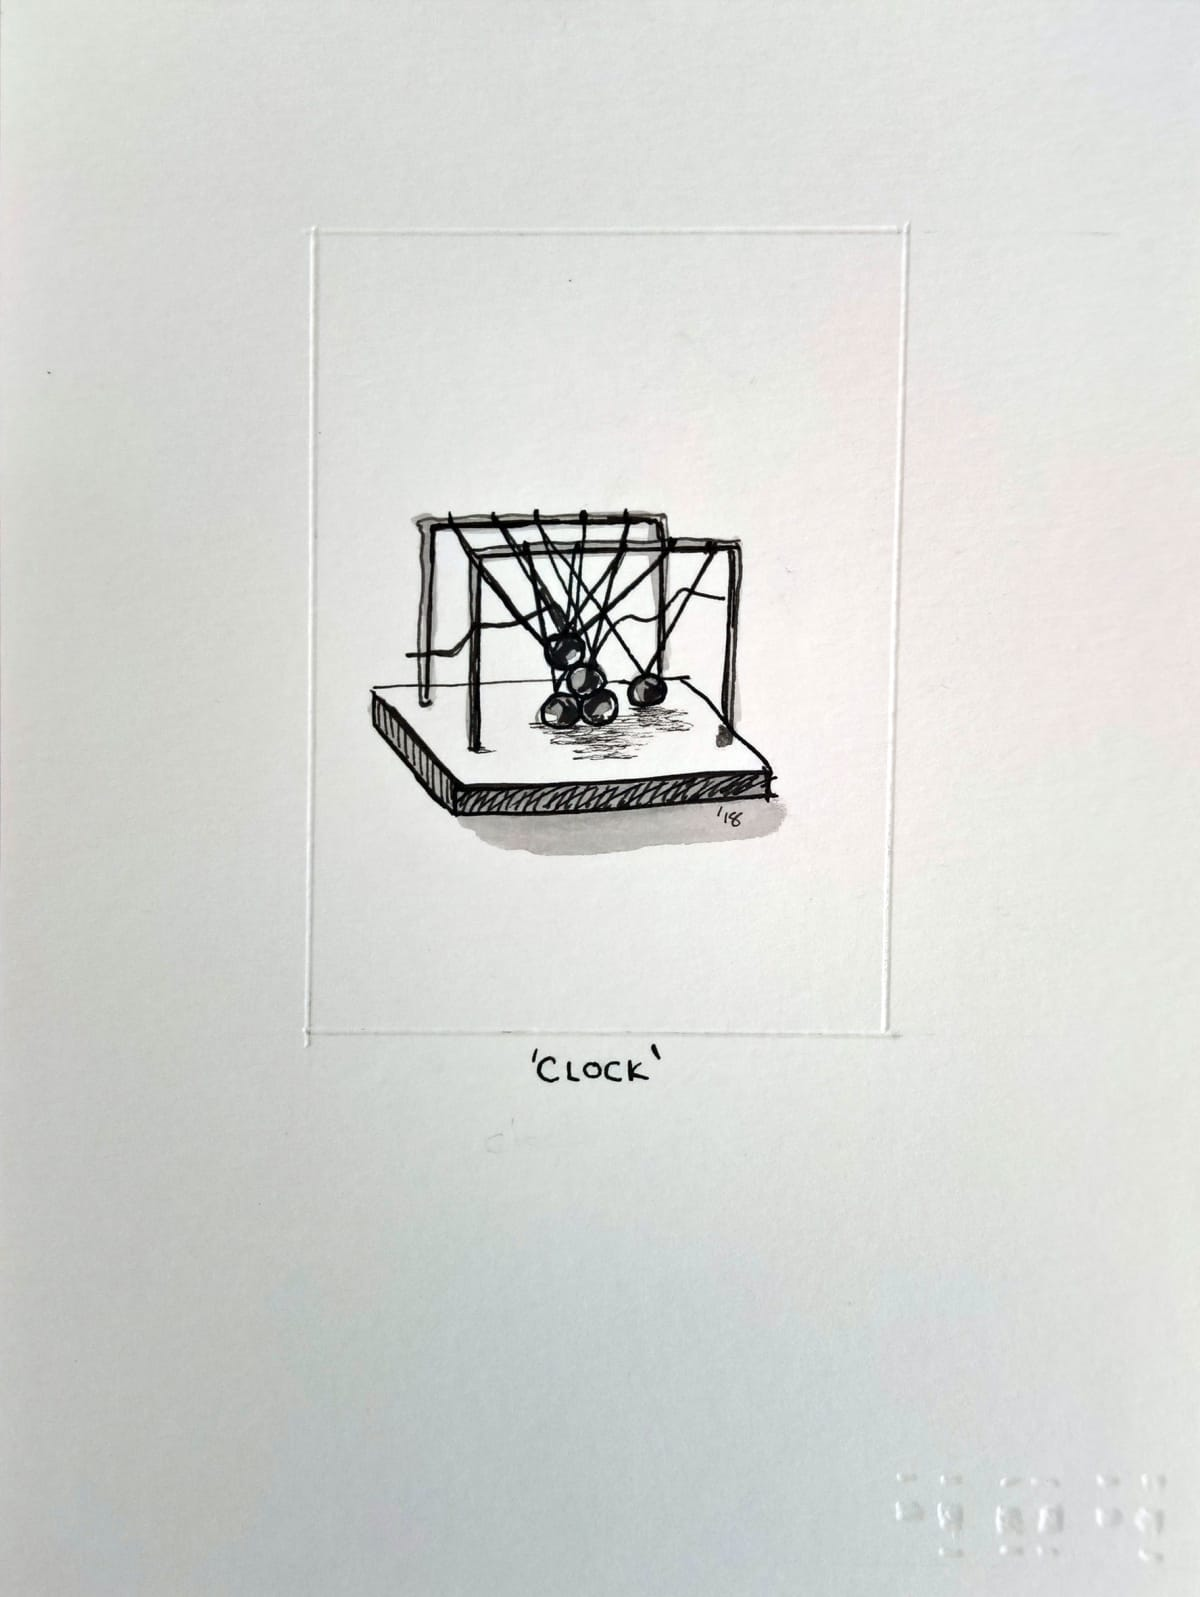 404, Clock (A), 2018